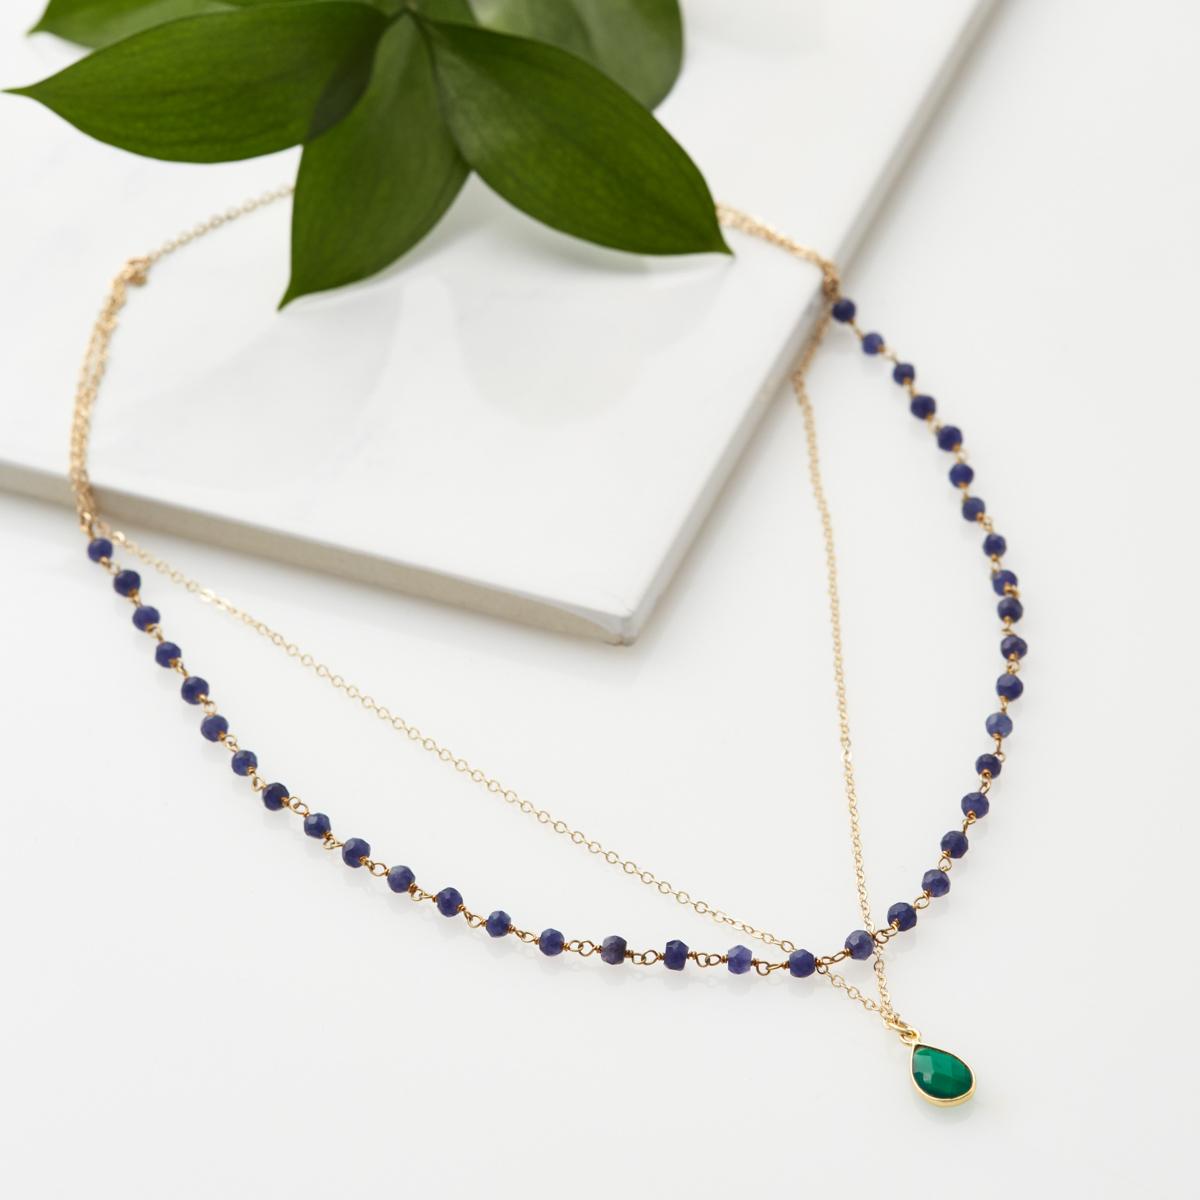 Gemstone-Layered-Necklace-Green-.jpg